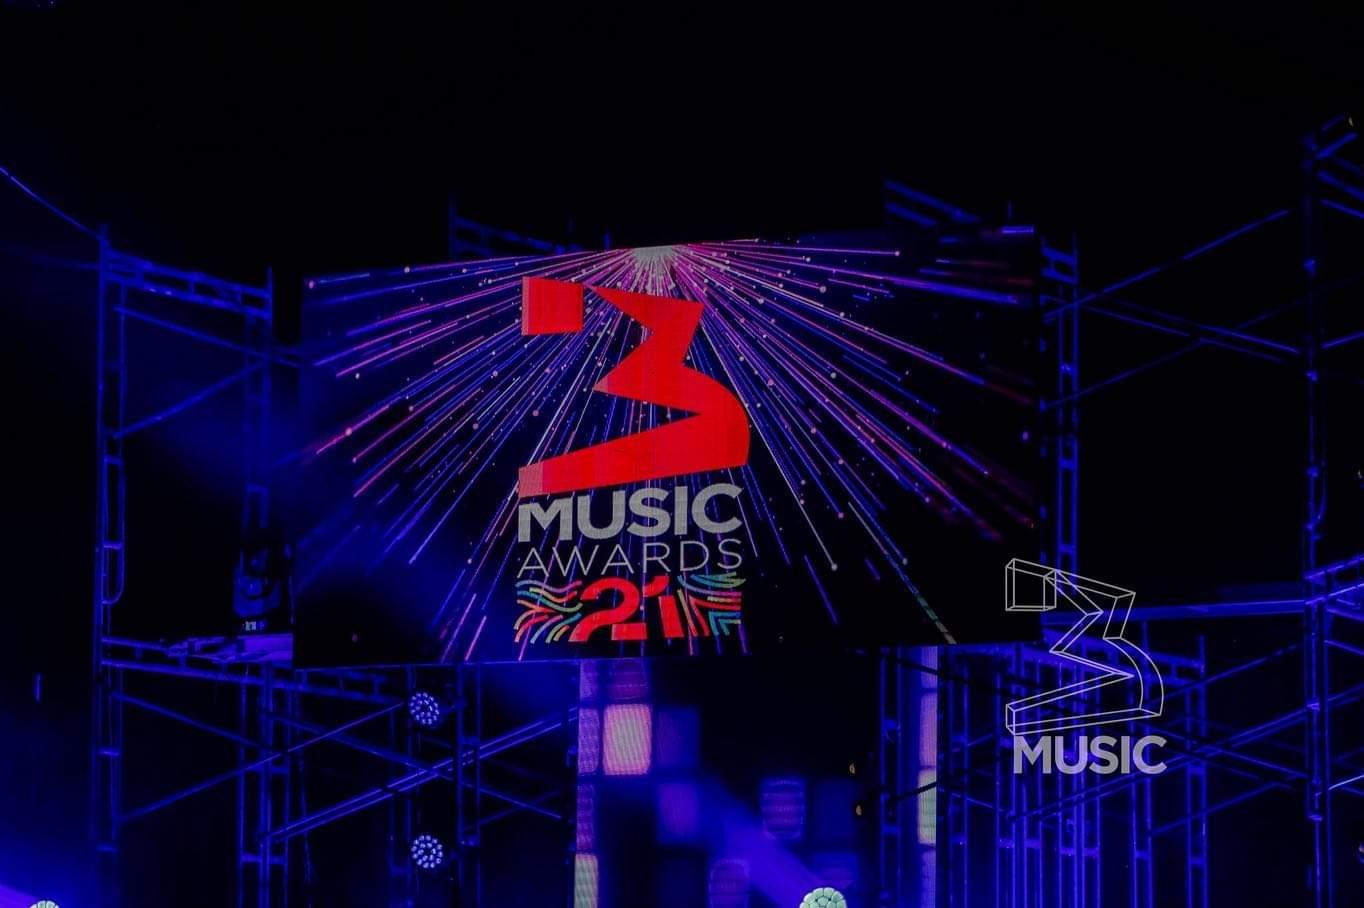 3 Music Awards 21